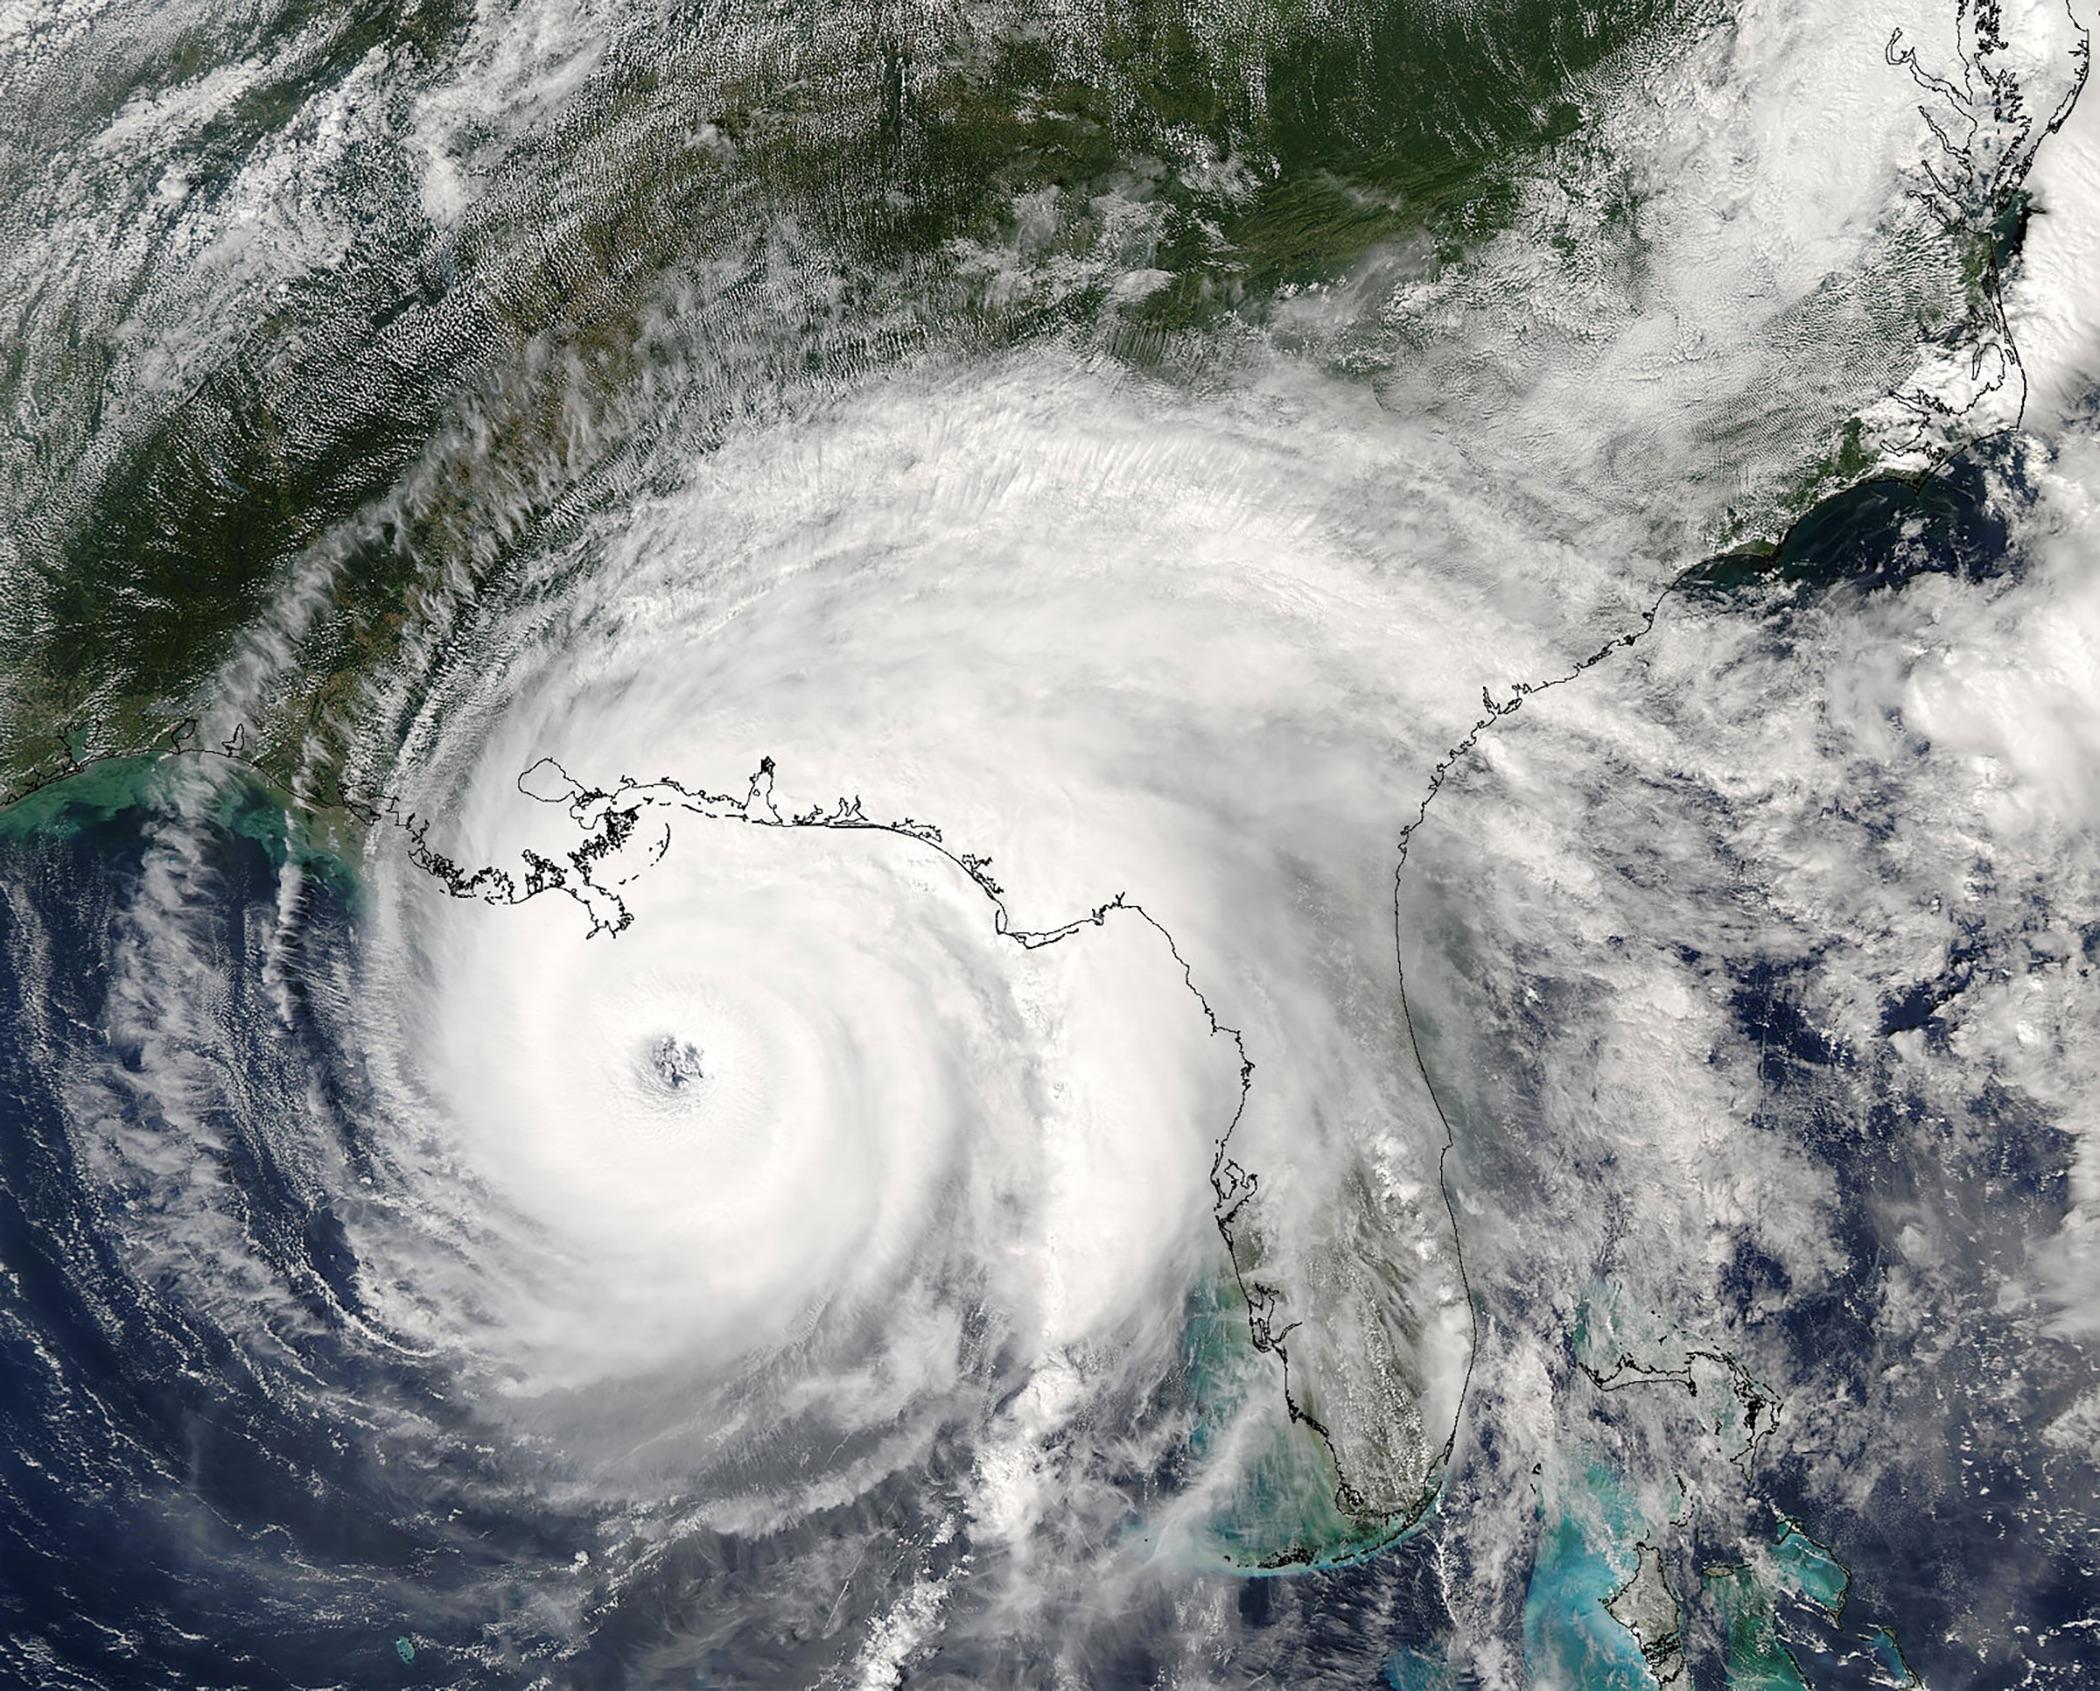 DSC-HR0719 04 Hurricane Ivan